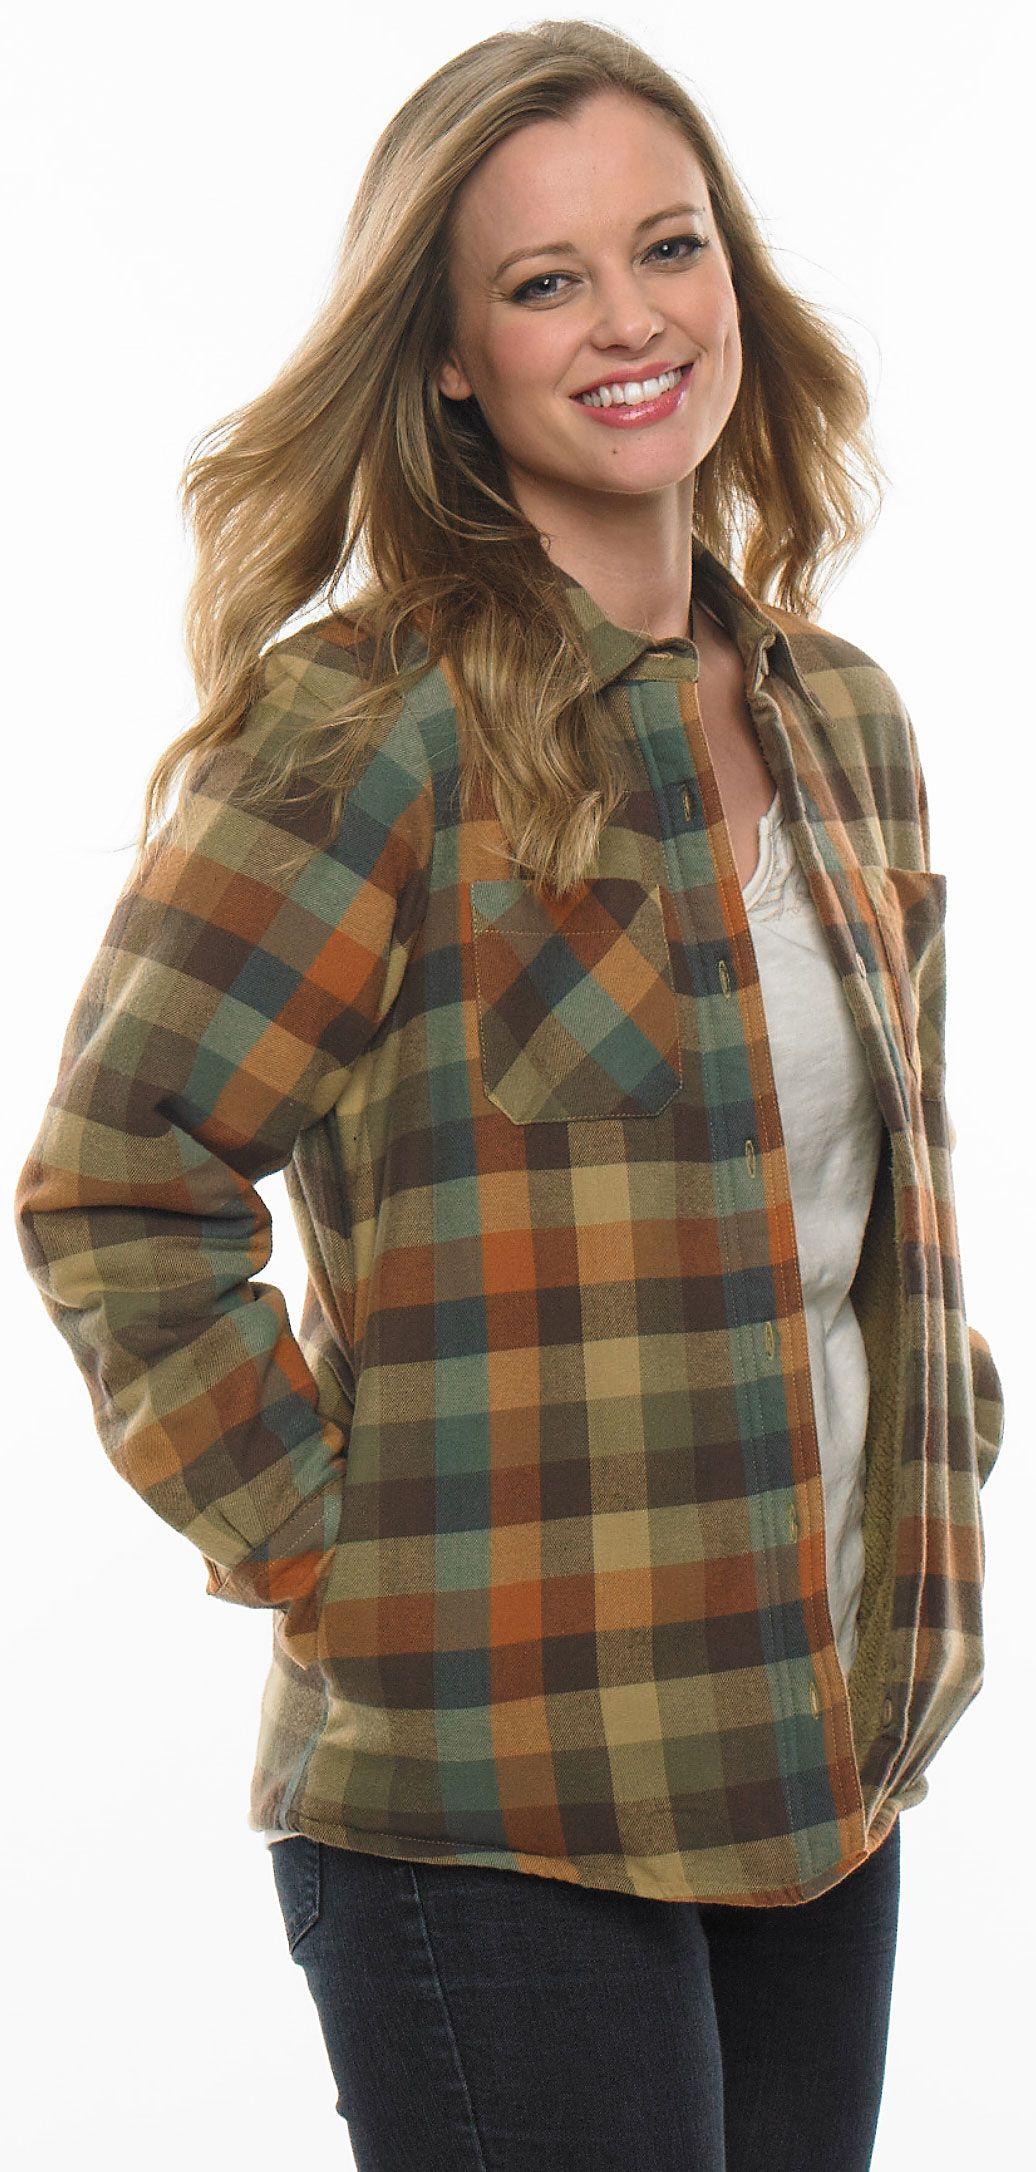 Womenus Open Country Plaid Shirt Jacket LegendaryWhitetails